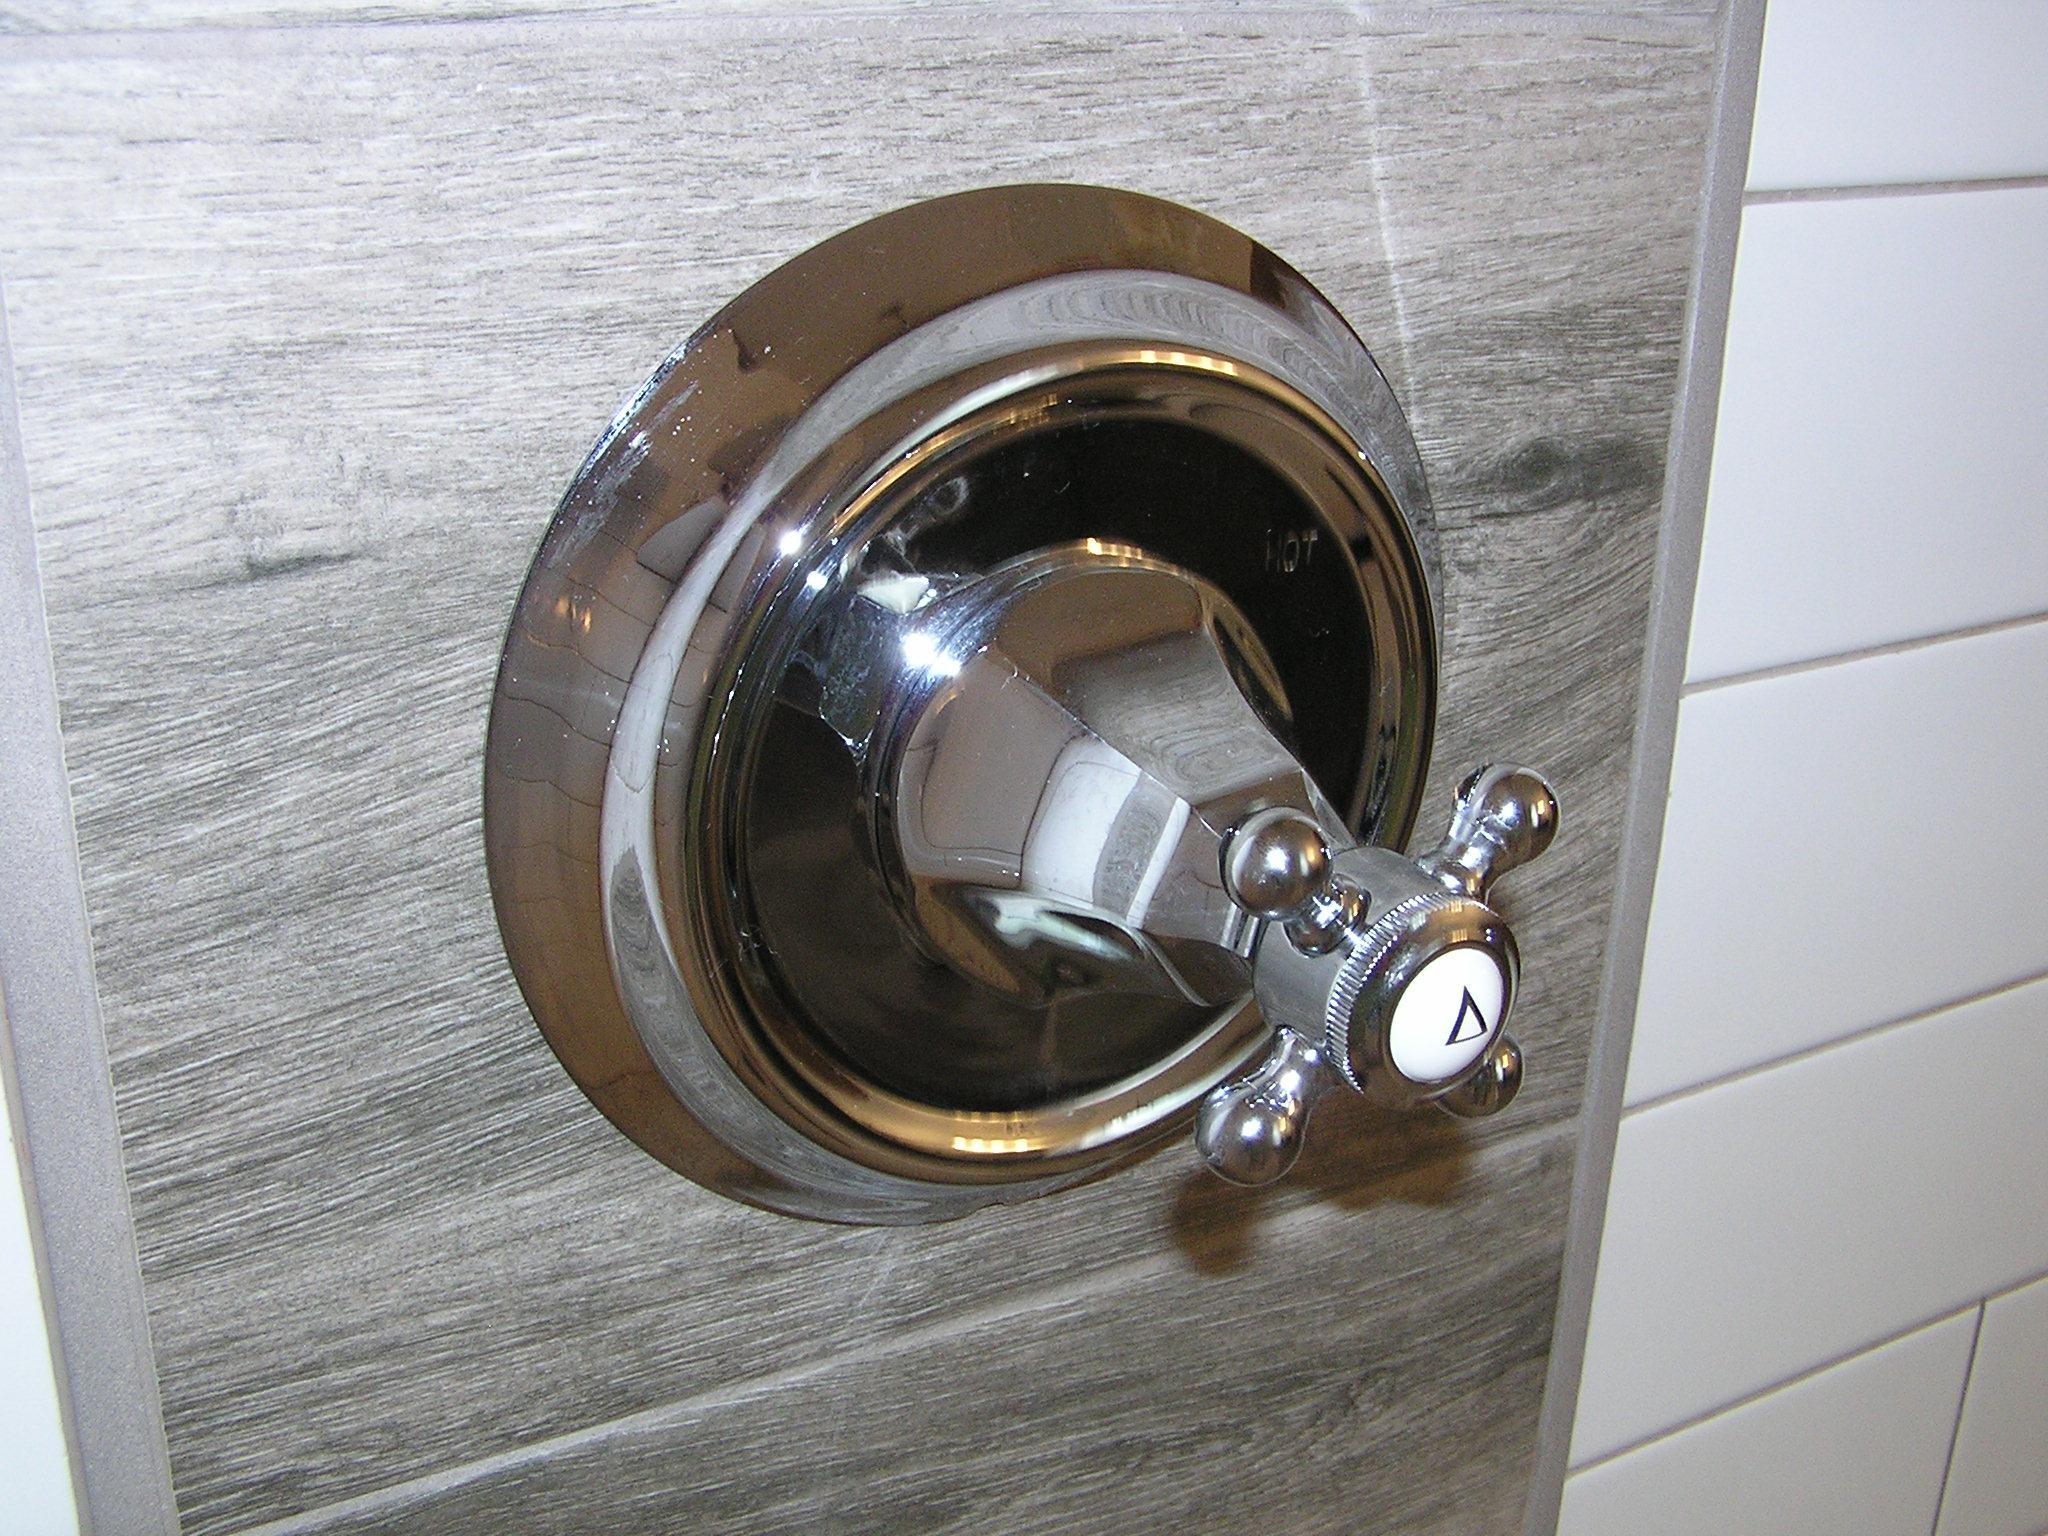 Shower fixture